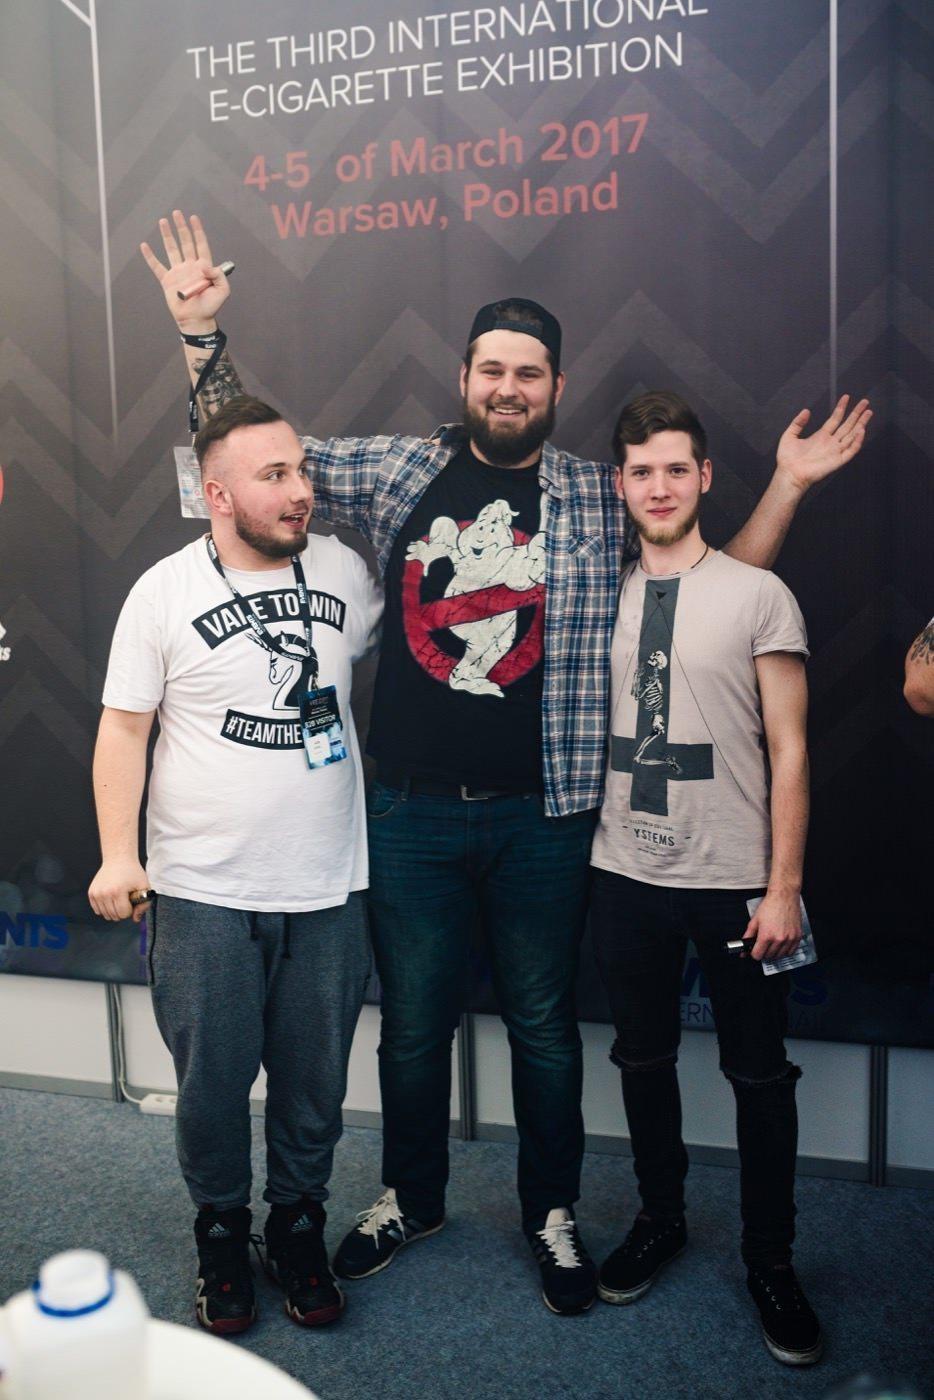 Zwycięzcy Vape Expo Poland 2017